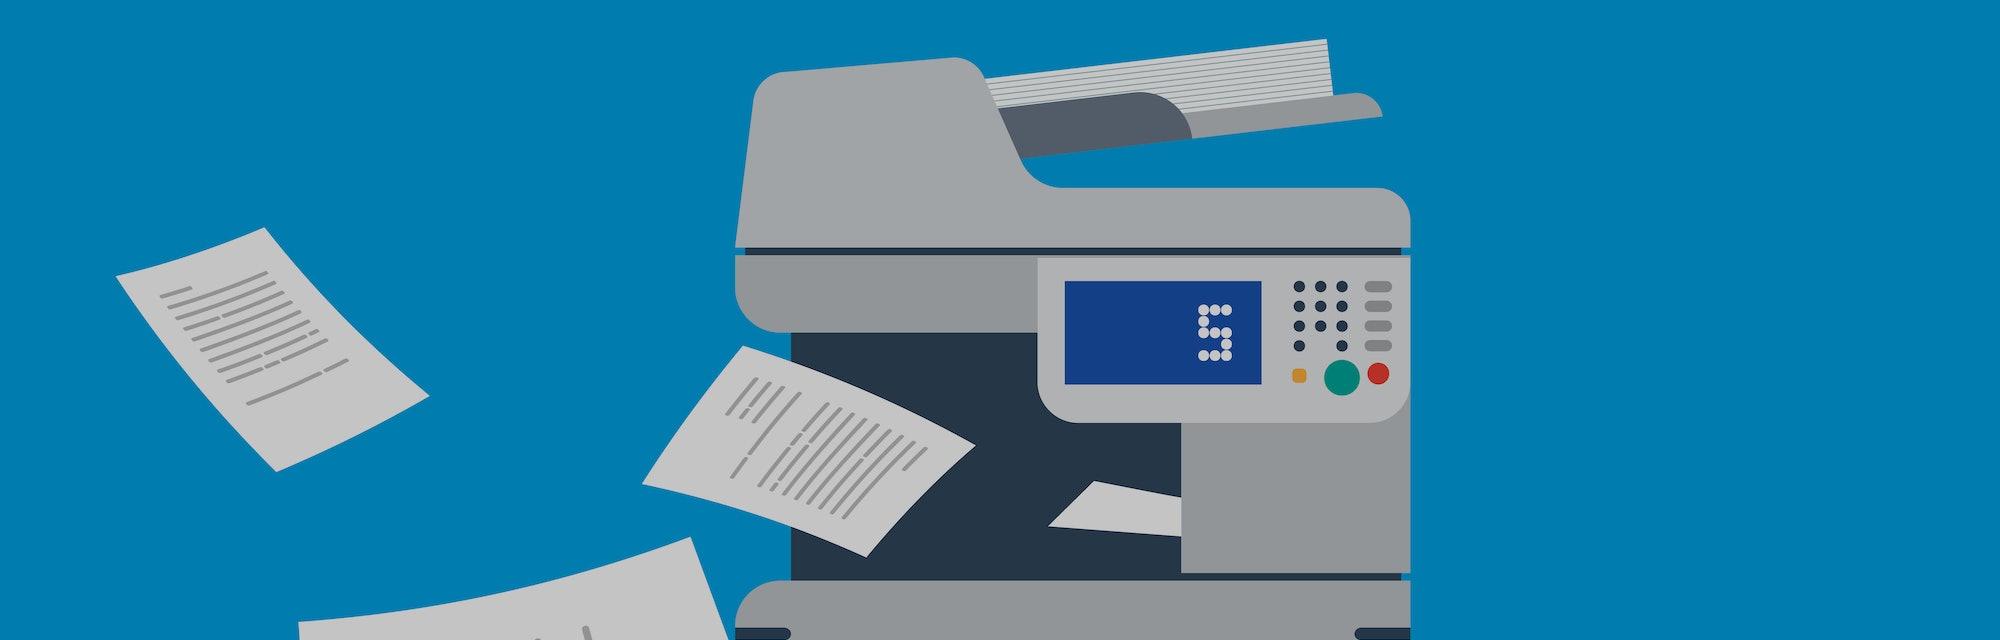 Office Multi-function Printer  scanner.  Isolated Flat Vector Illustration